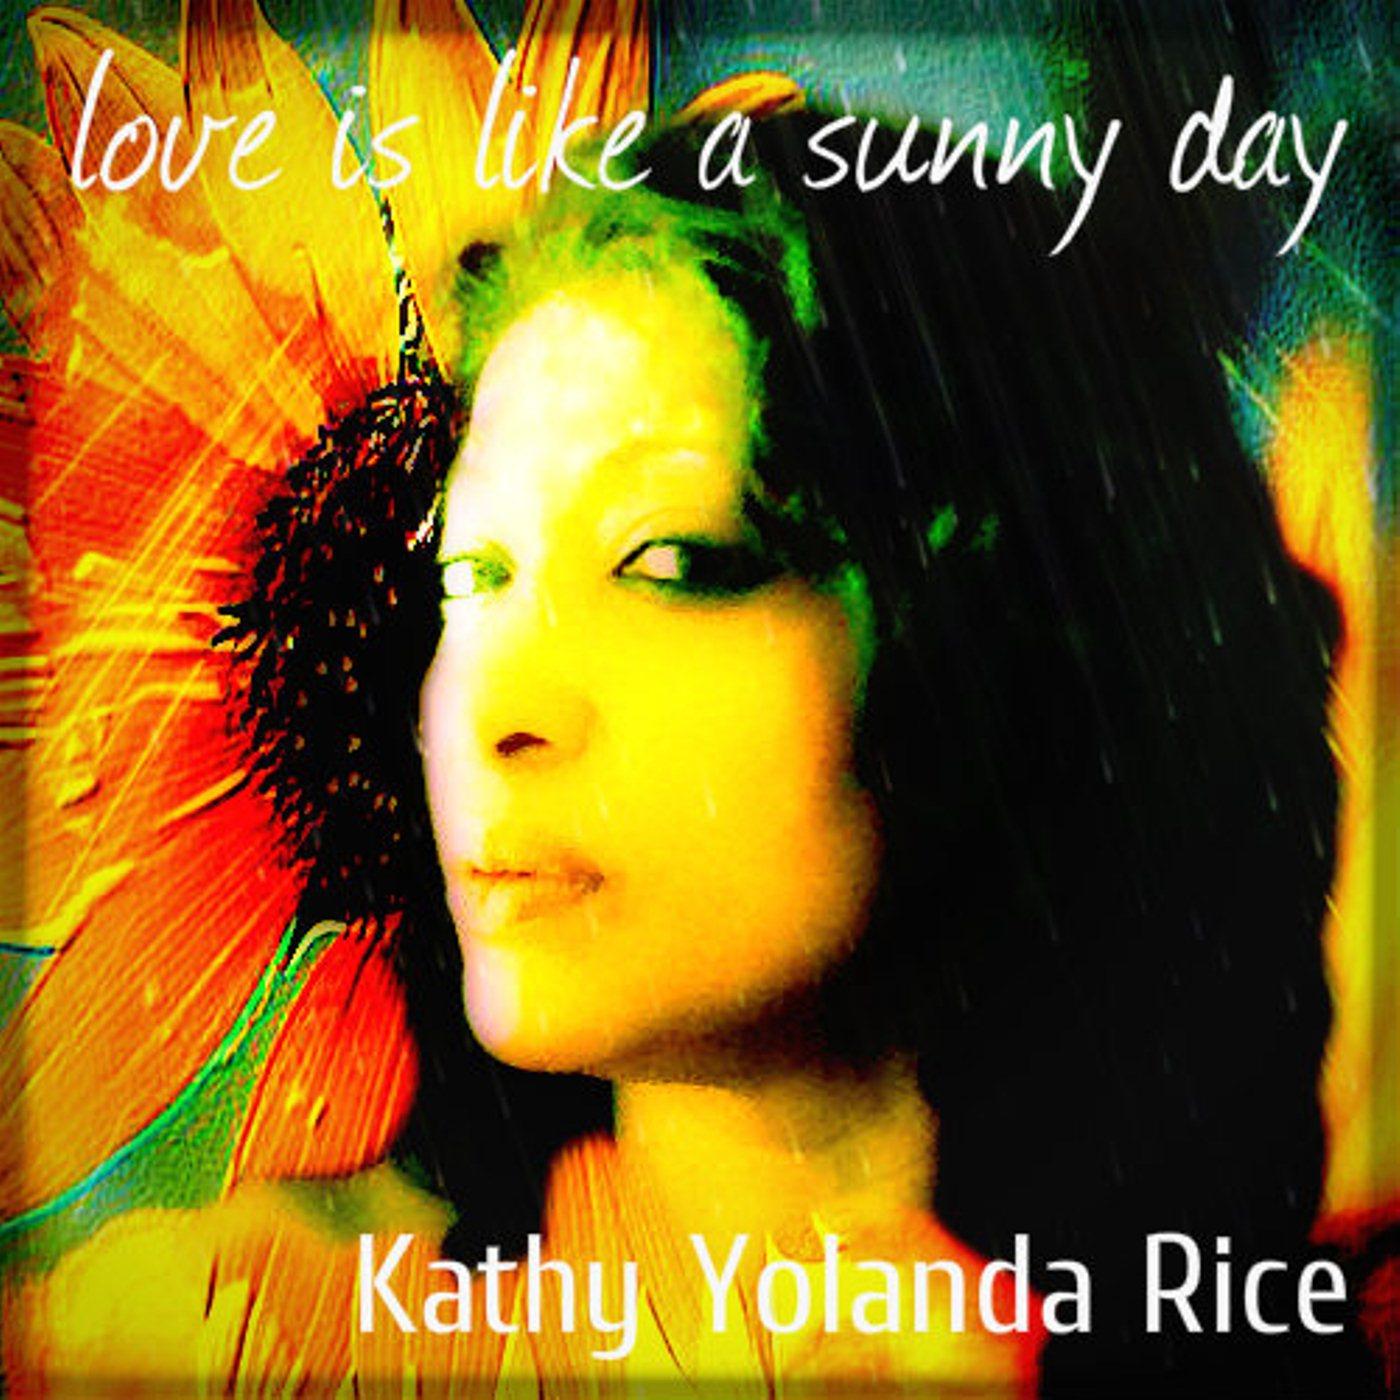 Kathy Yolanda Rice